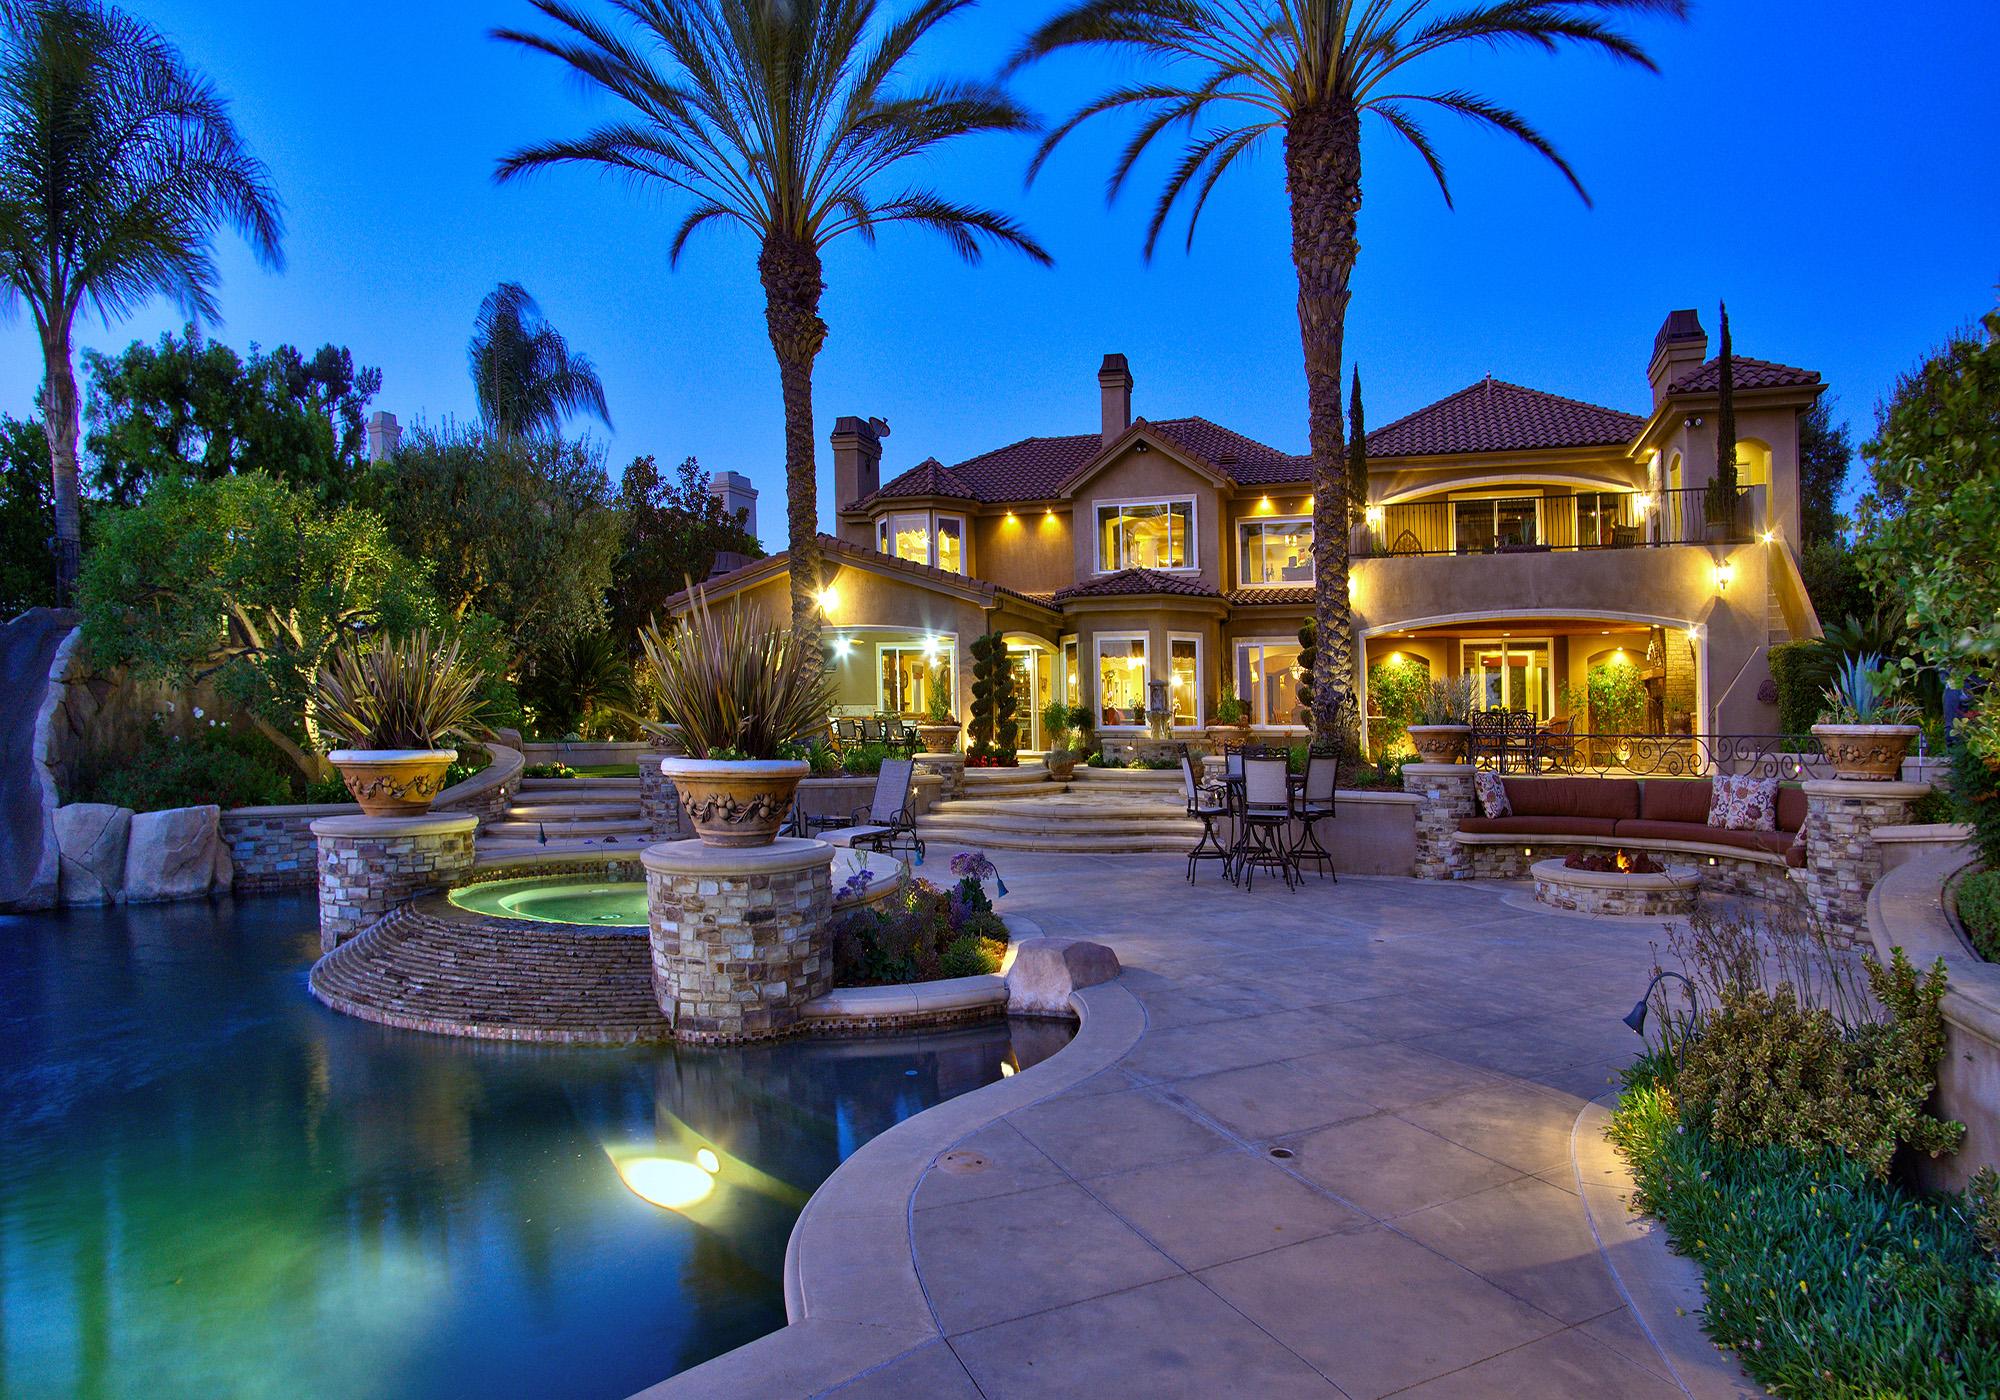 $4,500,000 Yorba Linda, CA